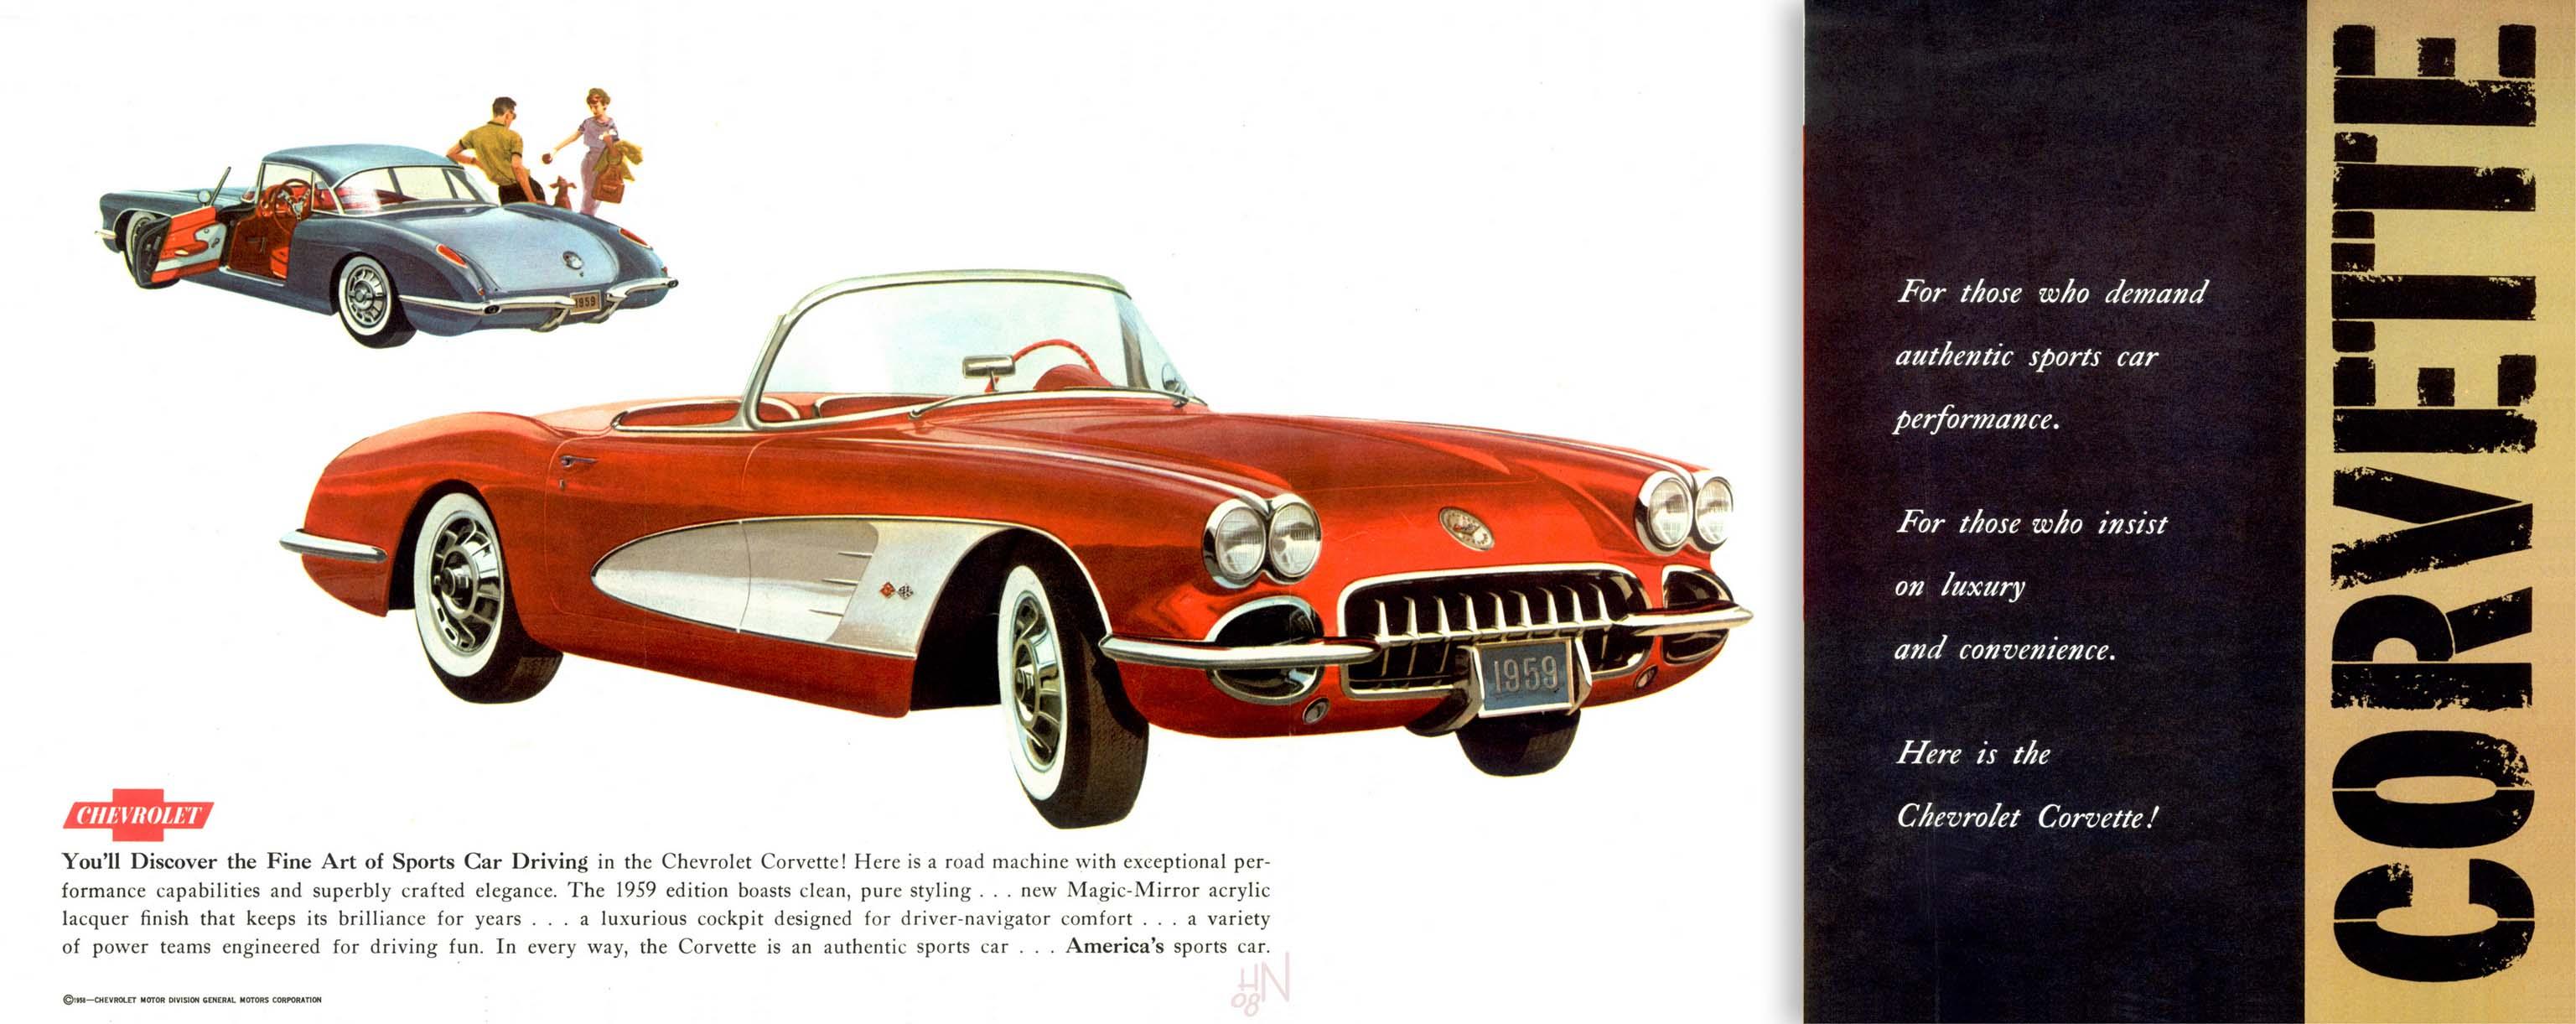 Directory Index: Chevrolet_Corvette/1959_Chevrolet_Corvette/1959 ...: www.oldcarbrochures.com/static/NA/Chevrolet_Corvette/1959_Chevrolet...